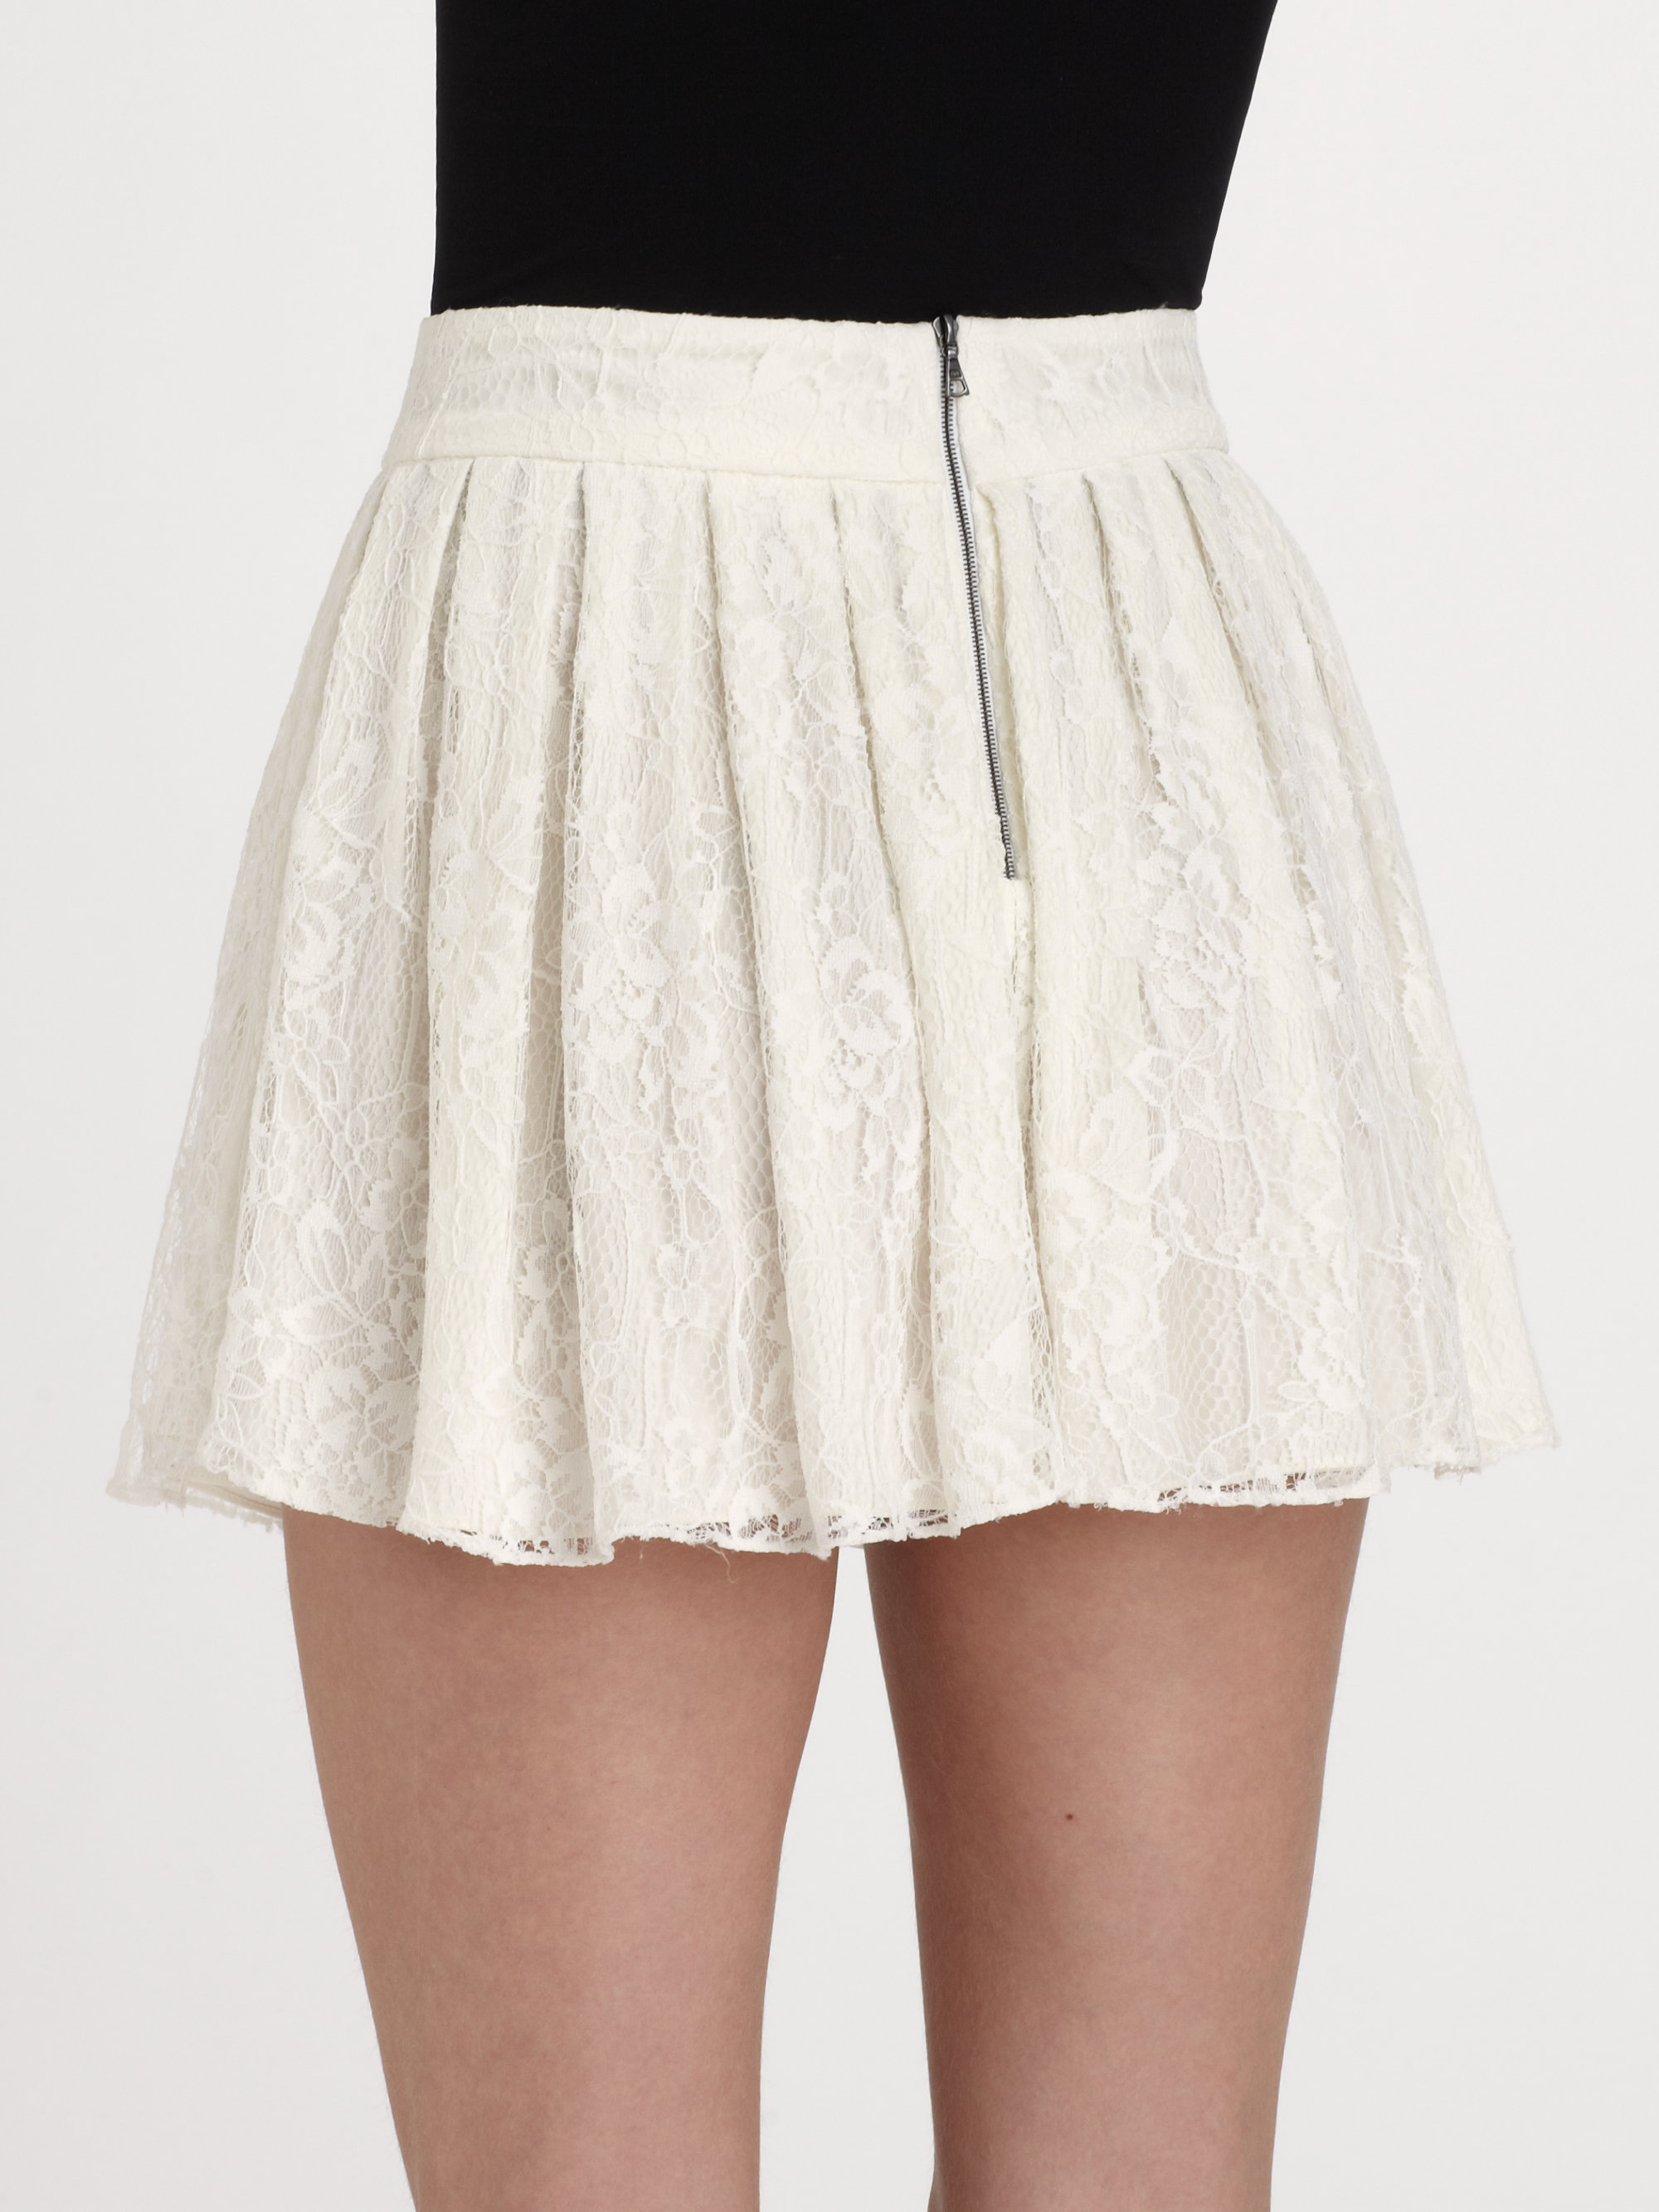 27495e37868d Alice + Olivia Rei Lace Mini Skirt in White - Lyst